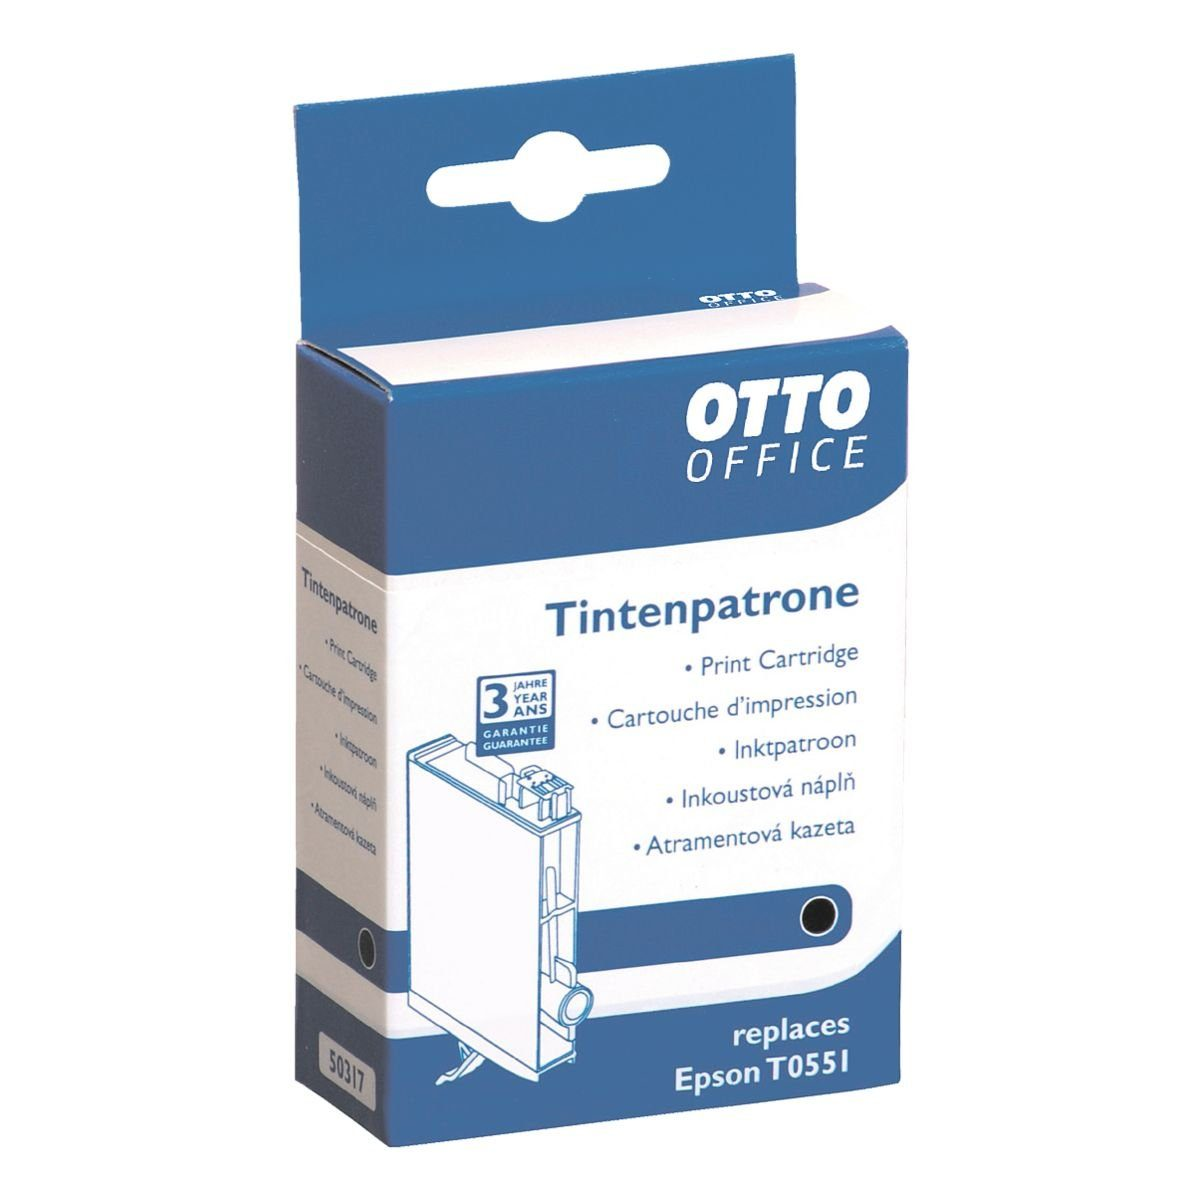 OTTO Office Standard Tintenpatrone ersetzt Epson »T0551«